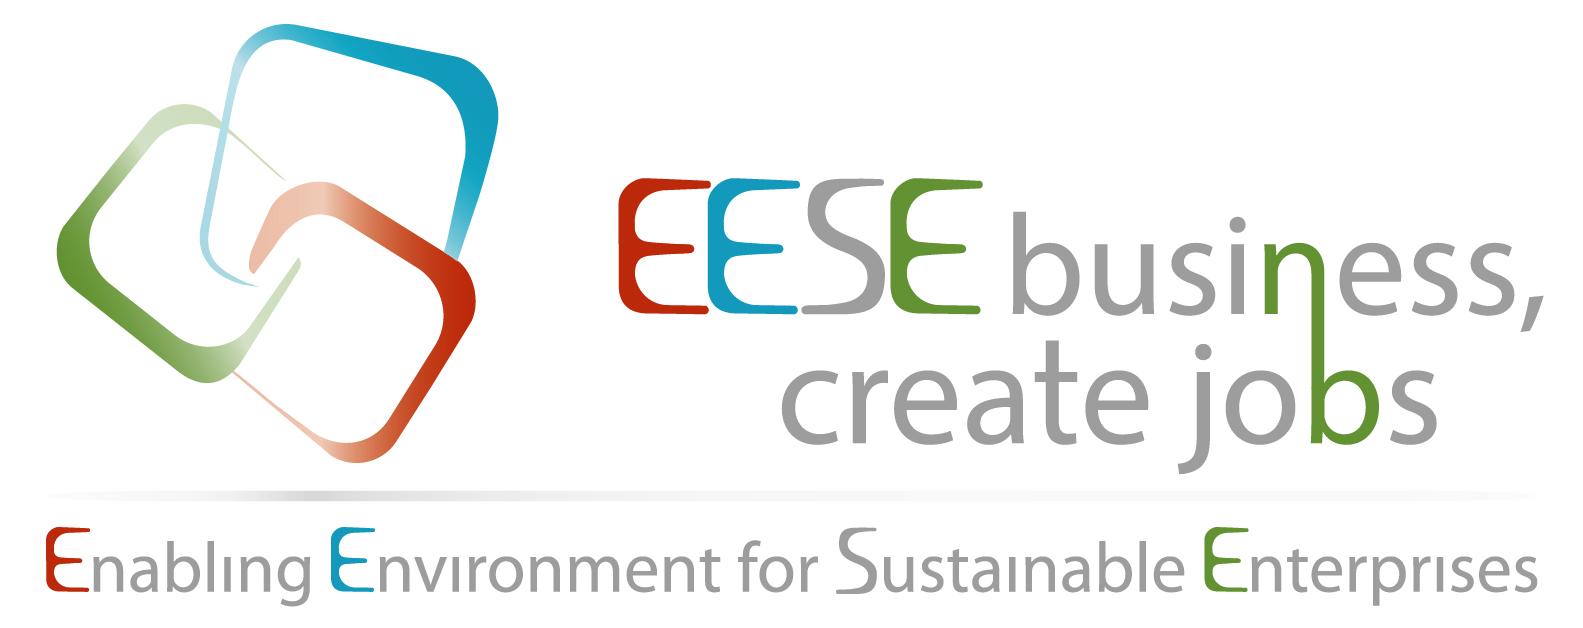 enabling environment for sustainable enterprises enterprises